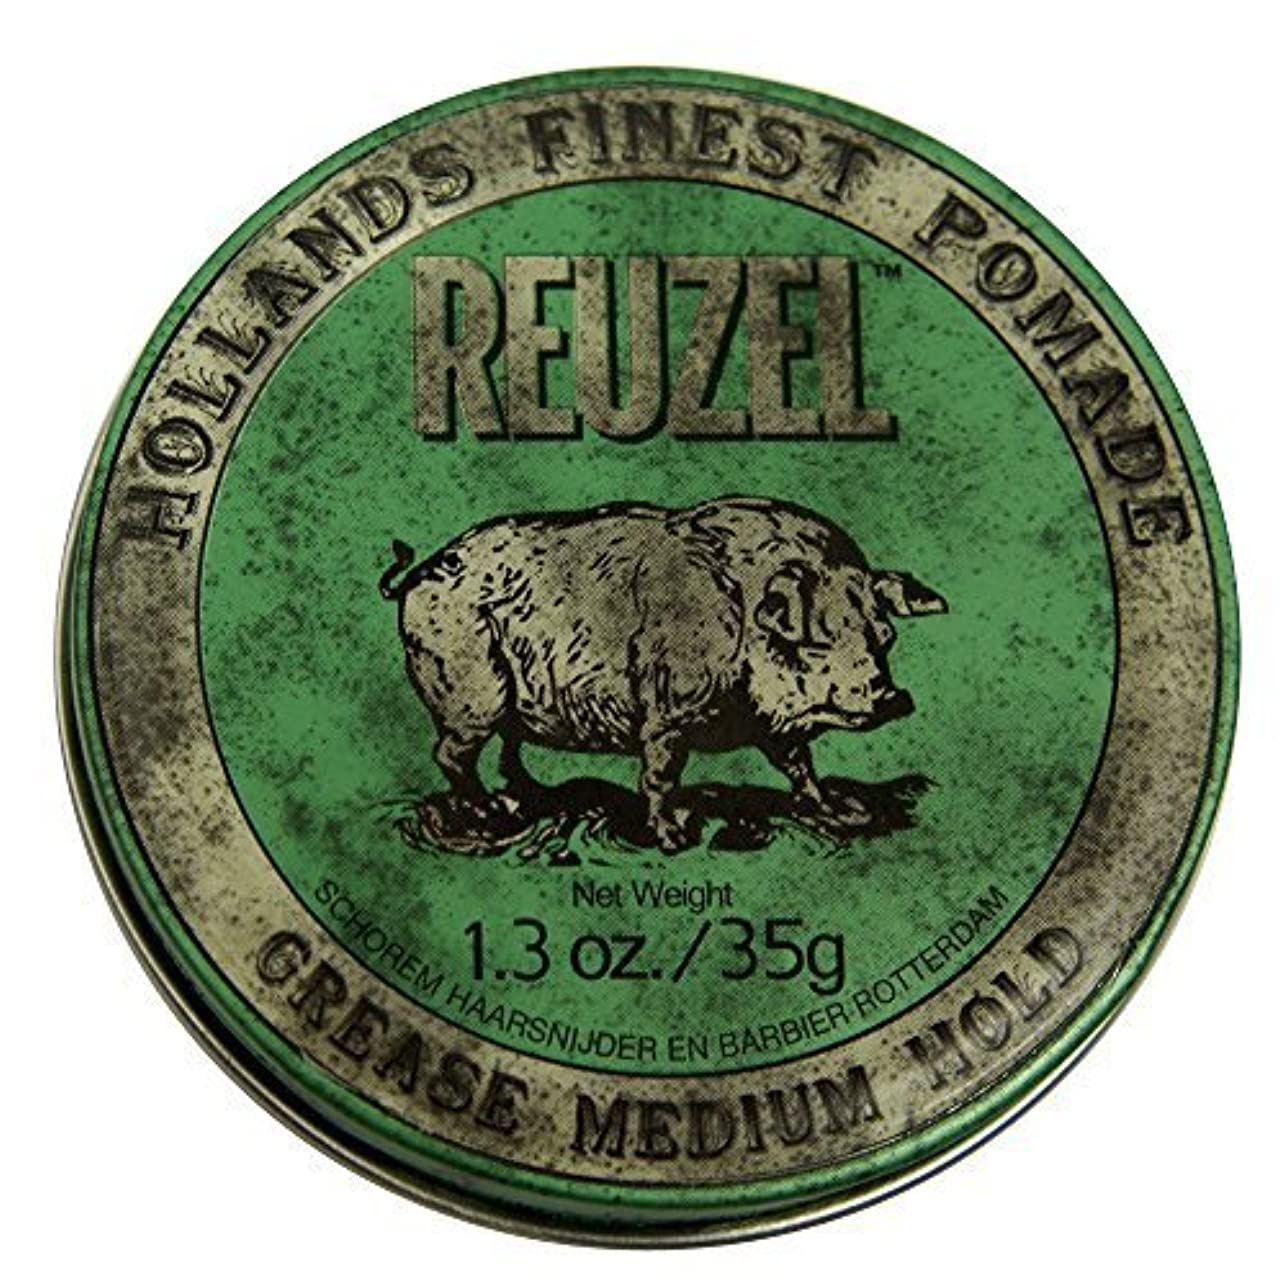 by Reuzel Reuzel Green Grease Medium Hold Hair Styling Pomade Piglet 1.3oz (35g) Wax/Gel [並行輸入品]